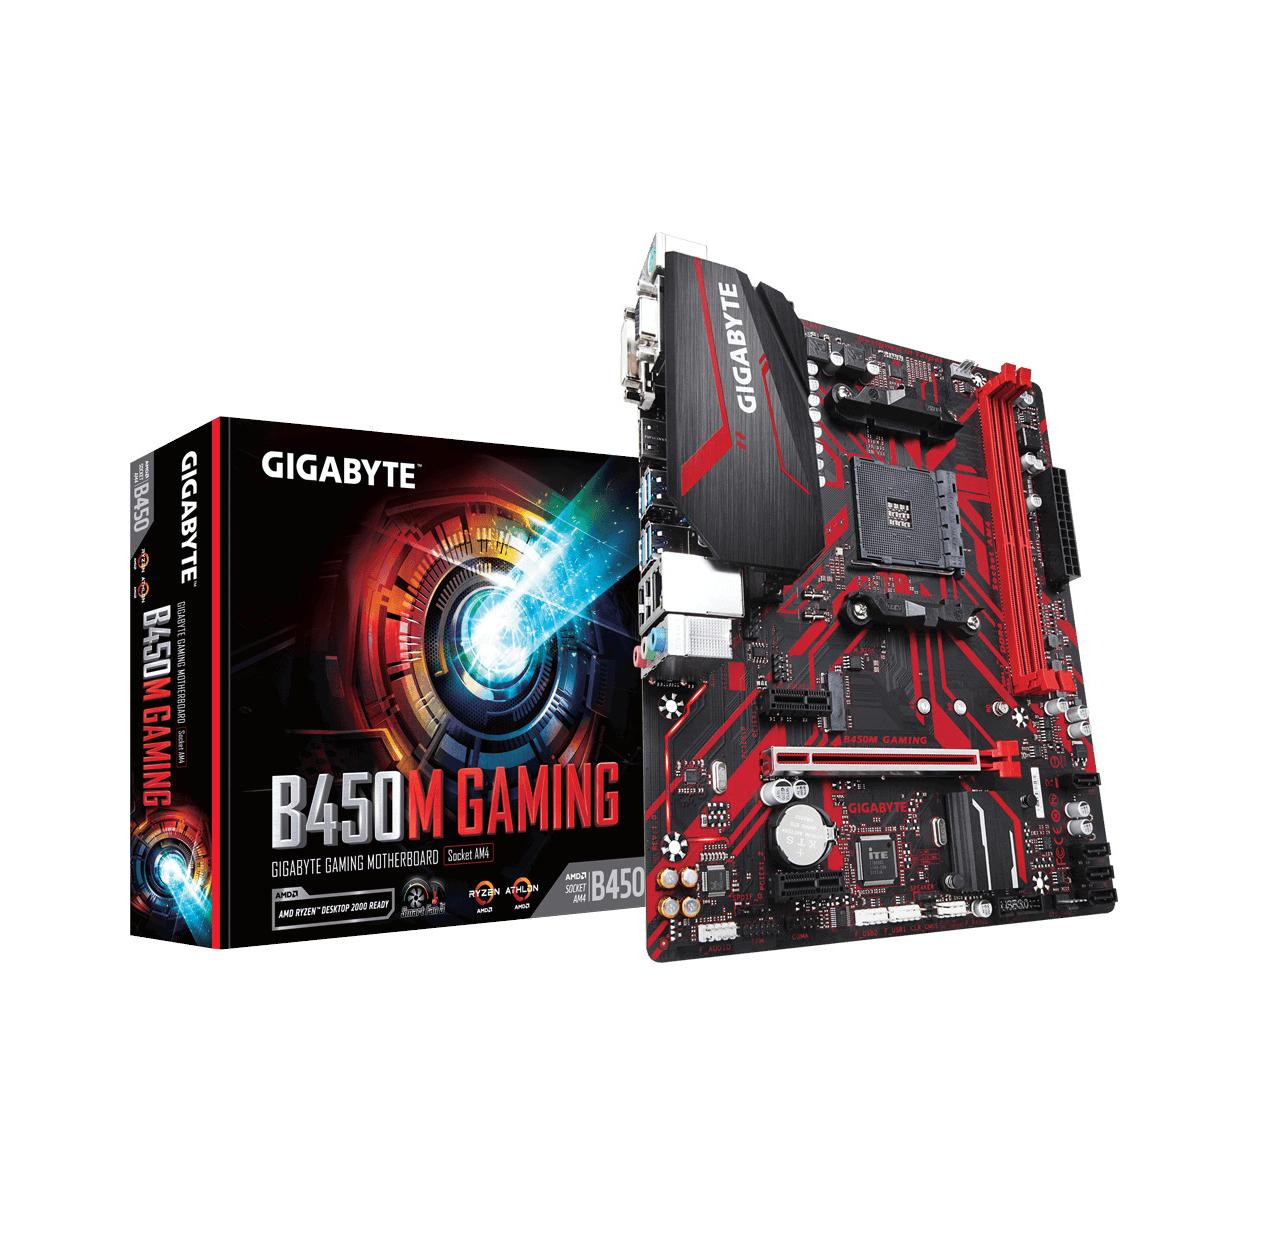 Gigabyte Aorus B450M Gaming Μητρική Κάρτα GA-B450M-GAMING